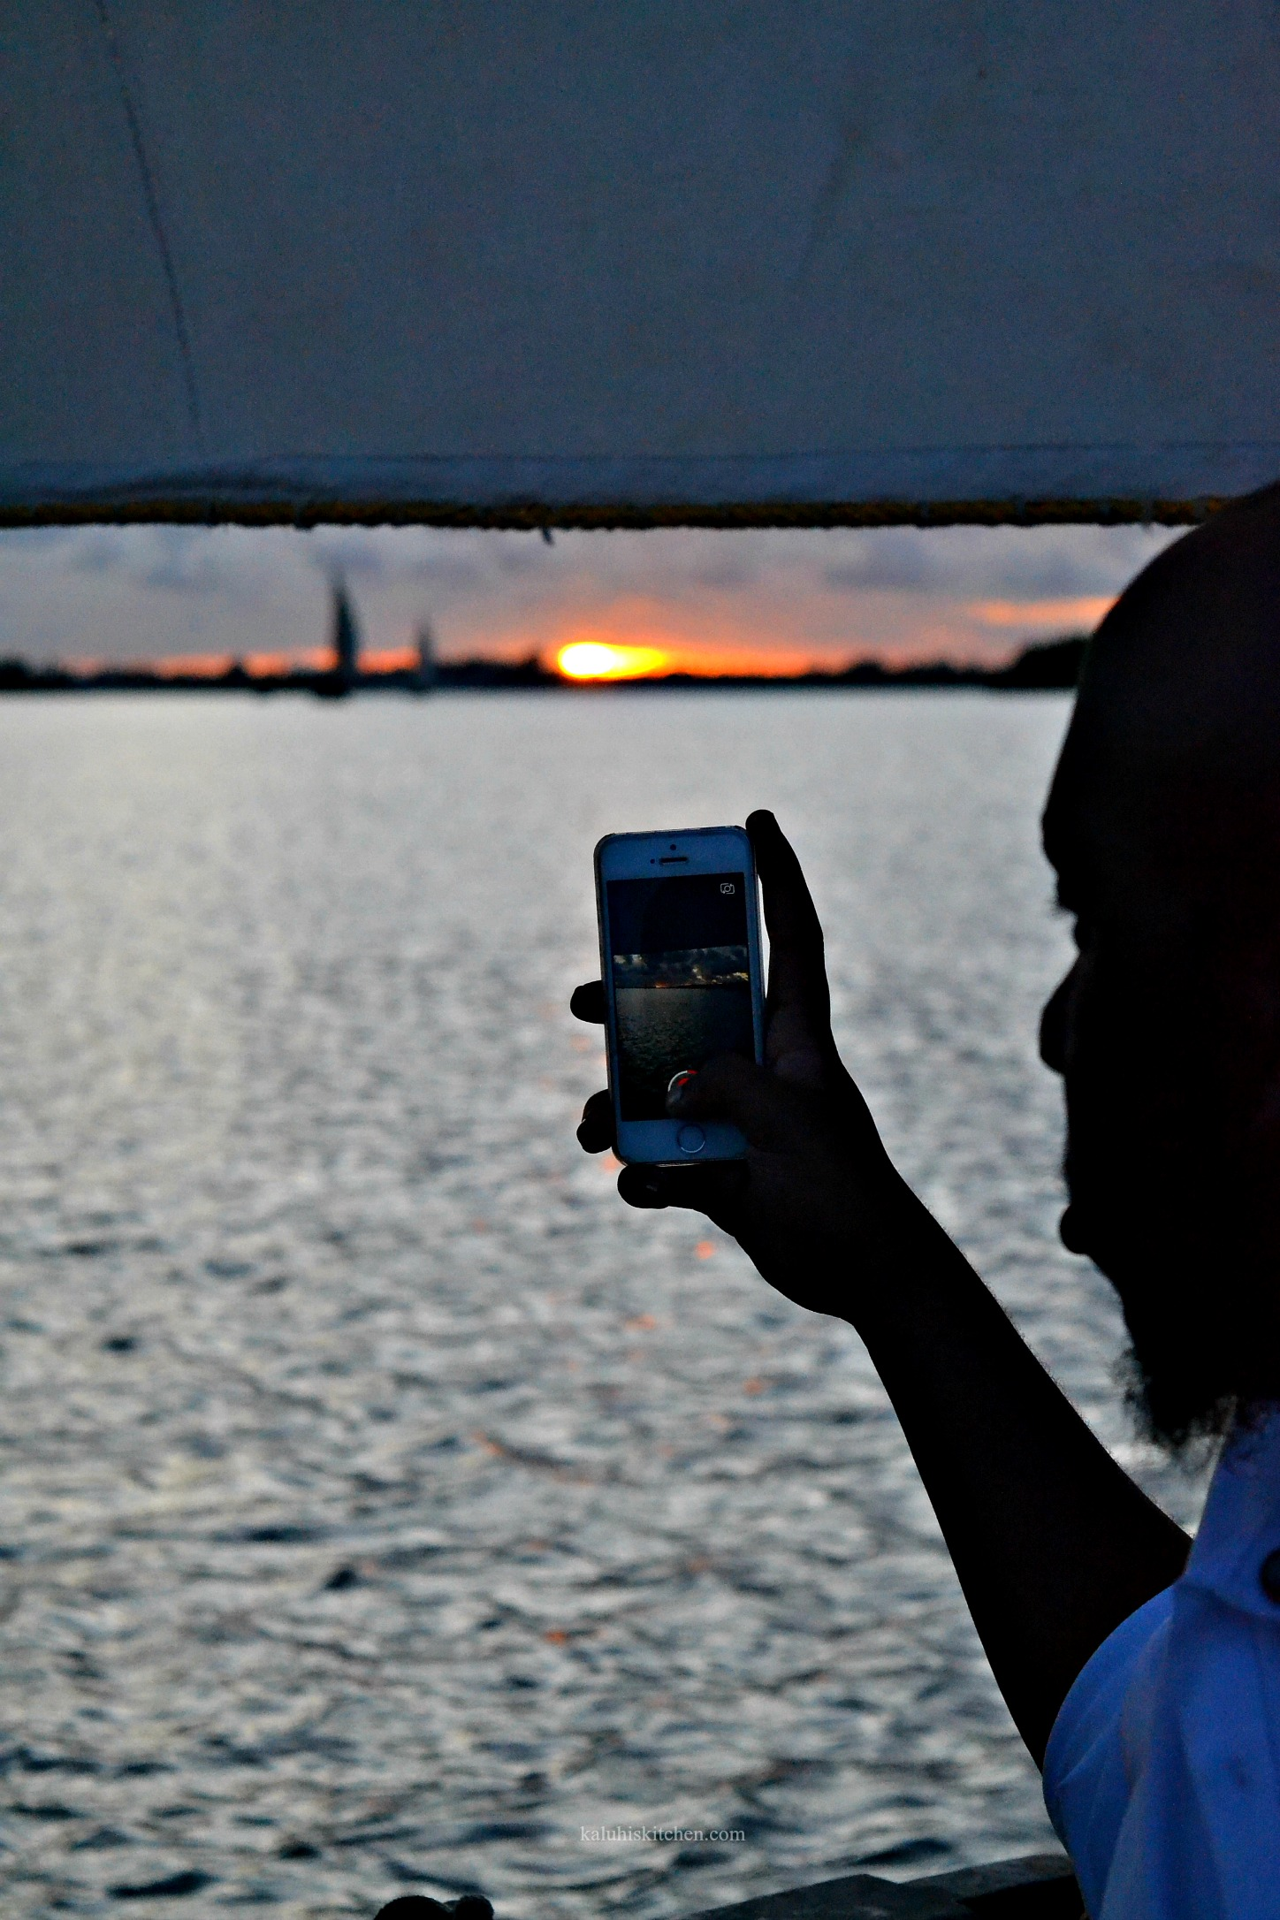 lamu dhow cruise_onja bloggers_onja_kaluhiskitchen.com_photo challenge